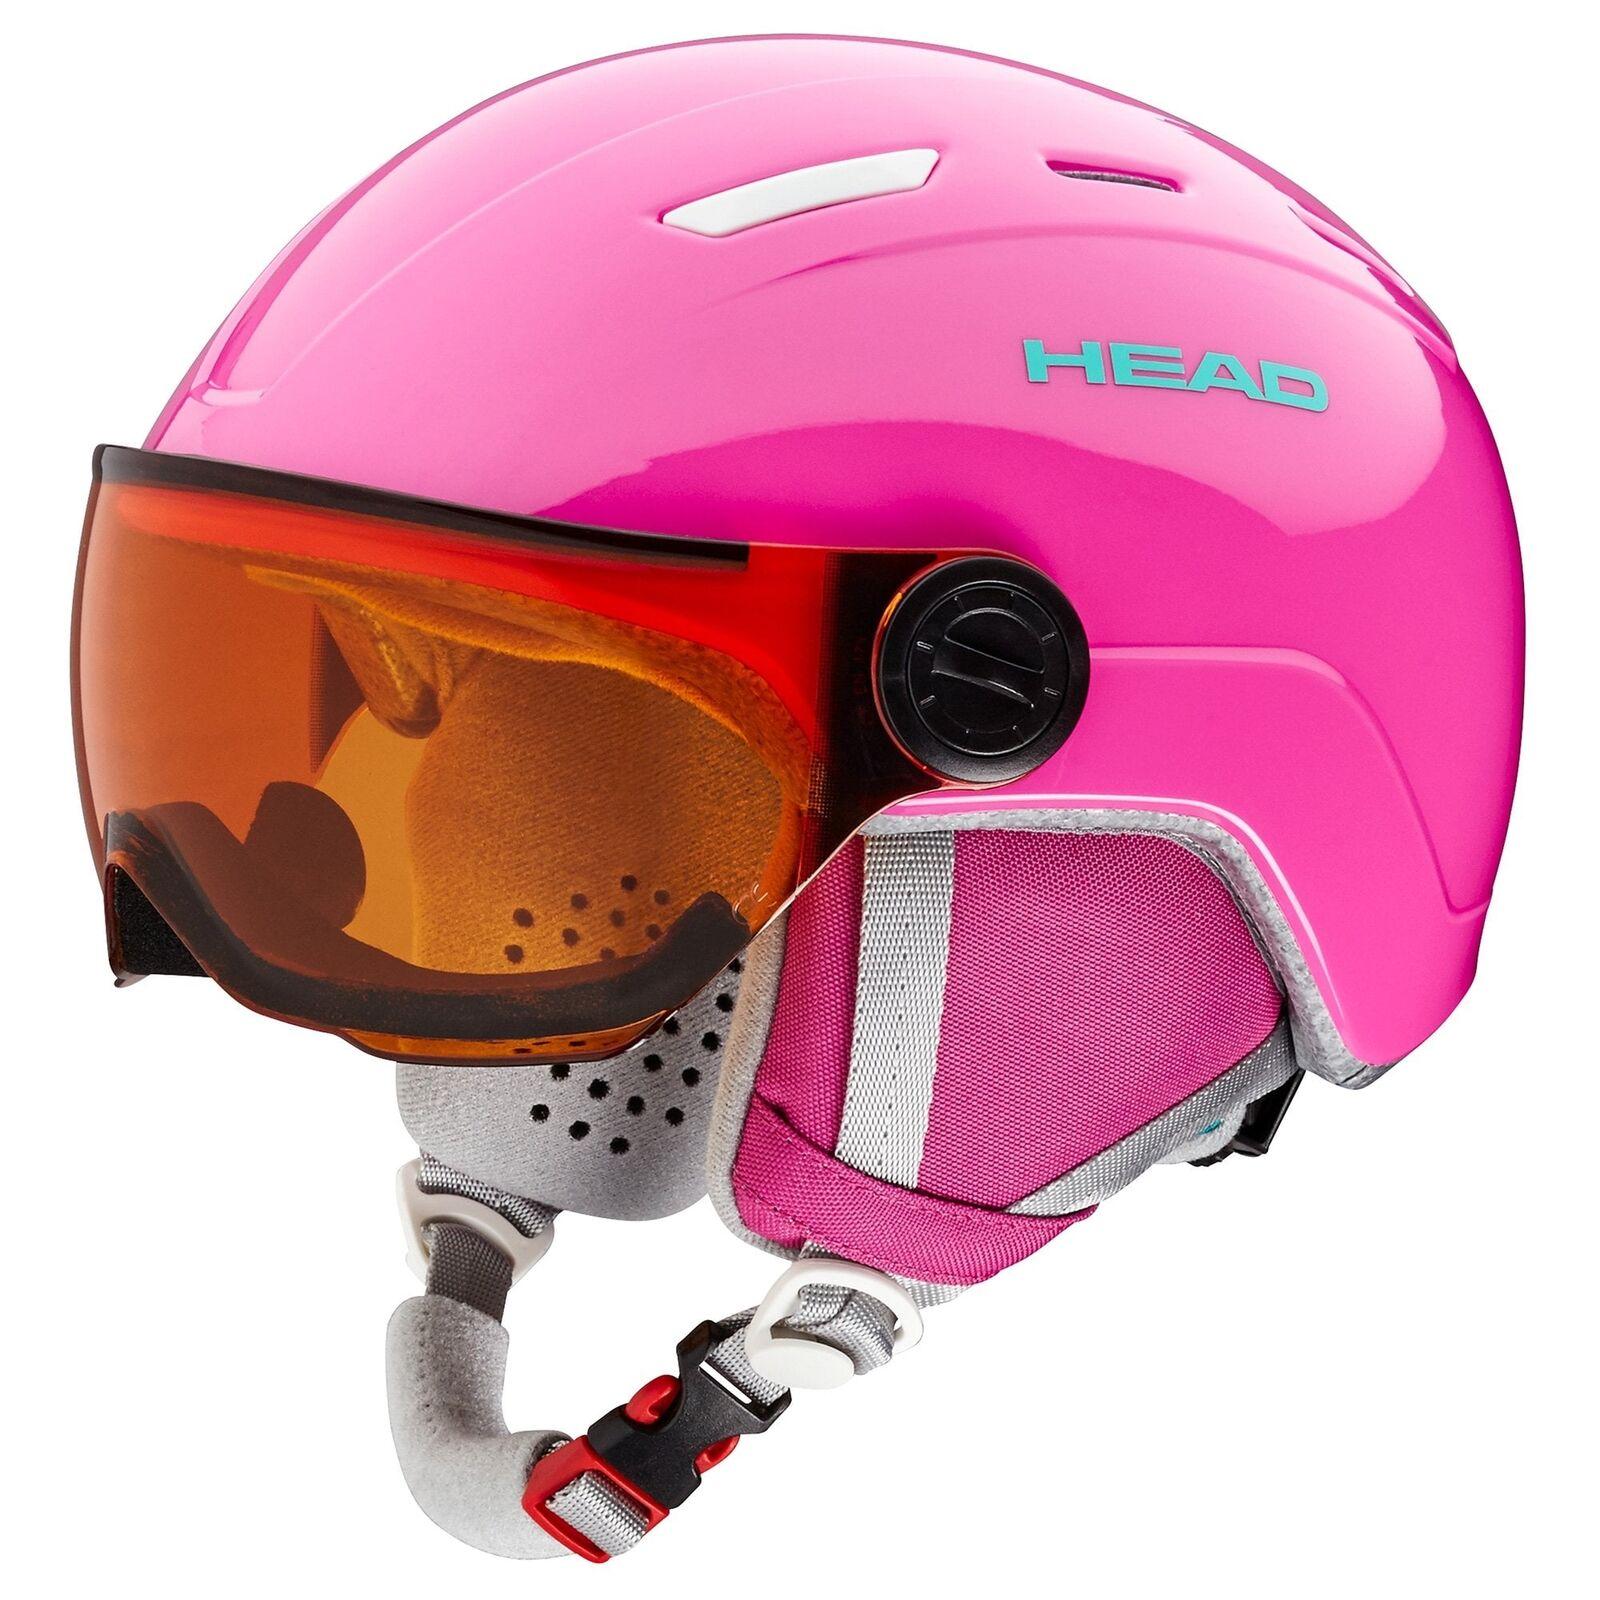 Head Maja Visor Junior Ski Helmet